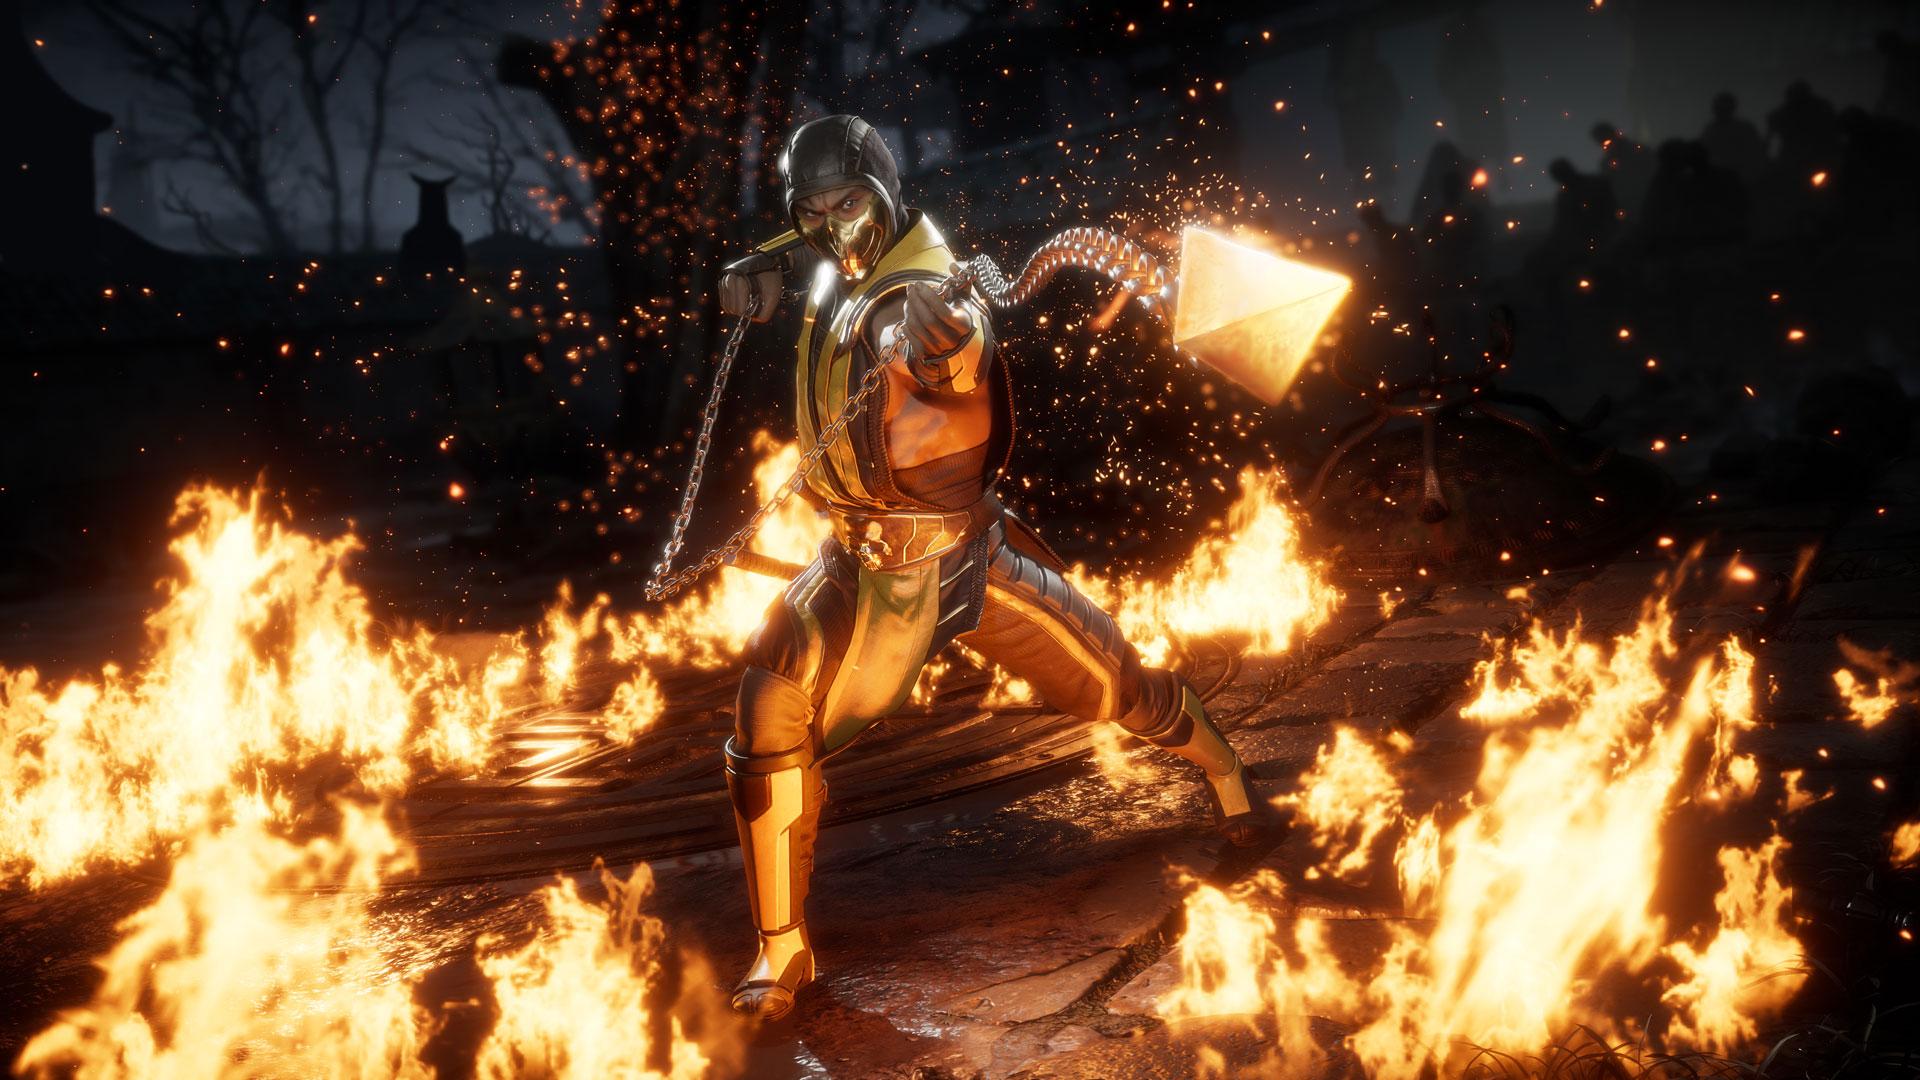 Save 60 On Mortal Kombat 11 On Steam